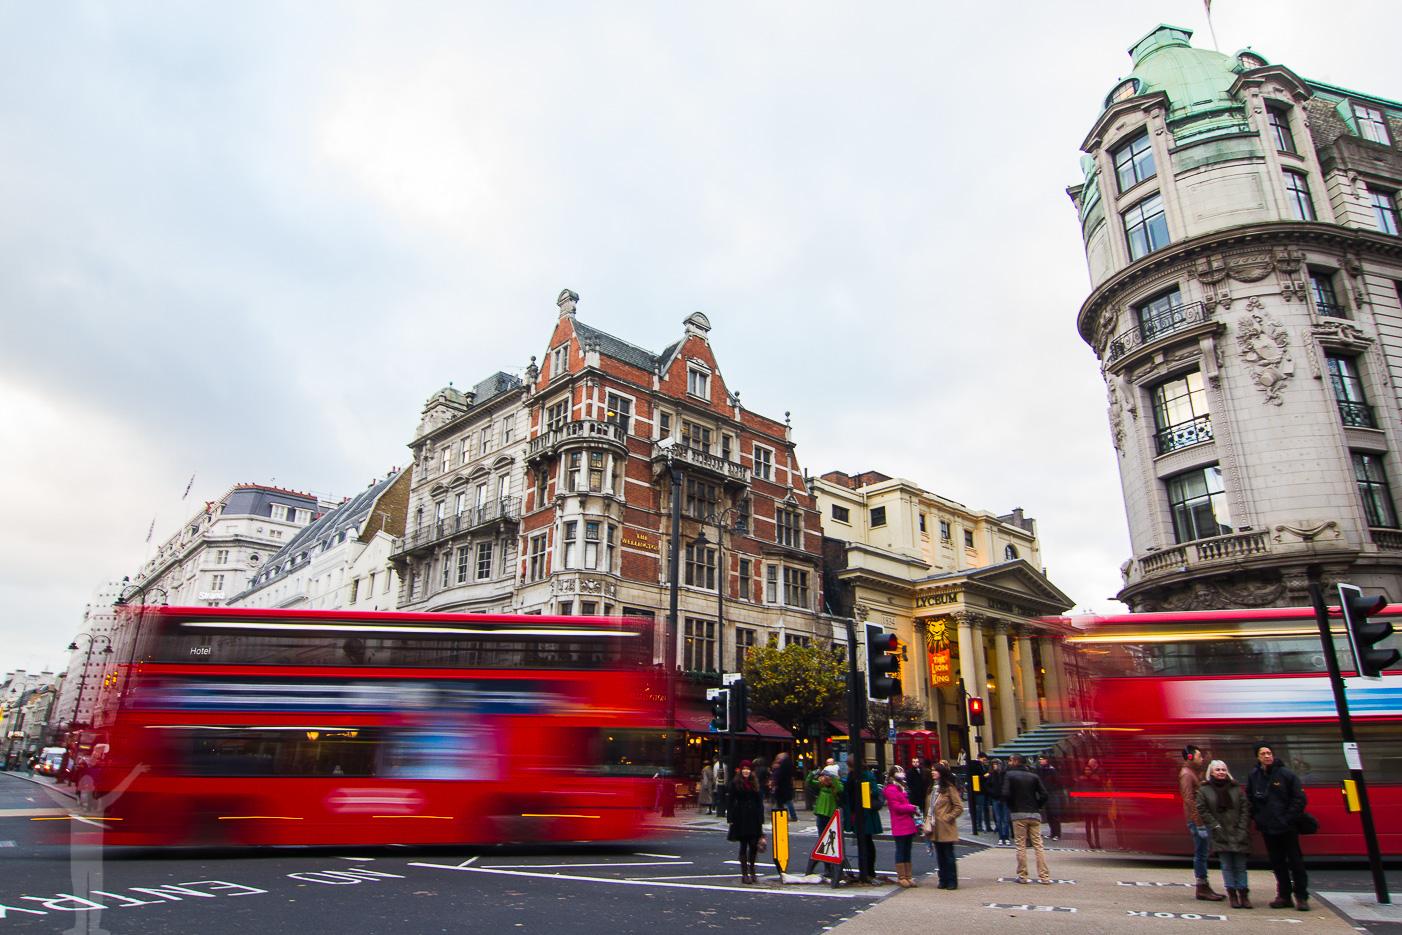 Trafik i London